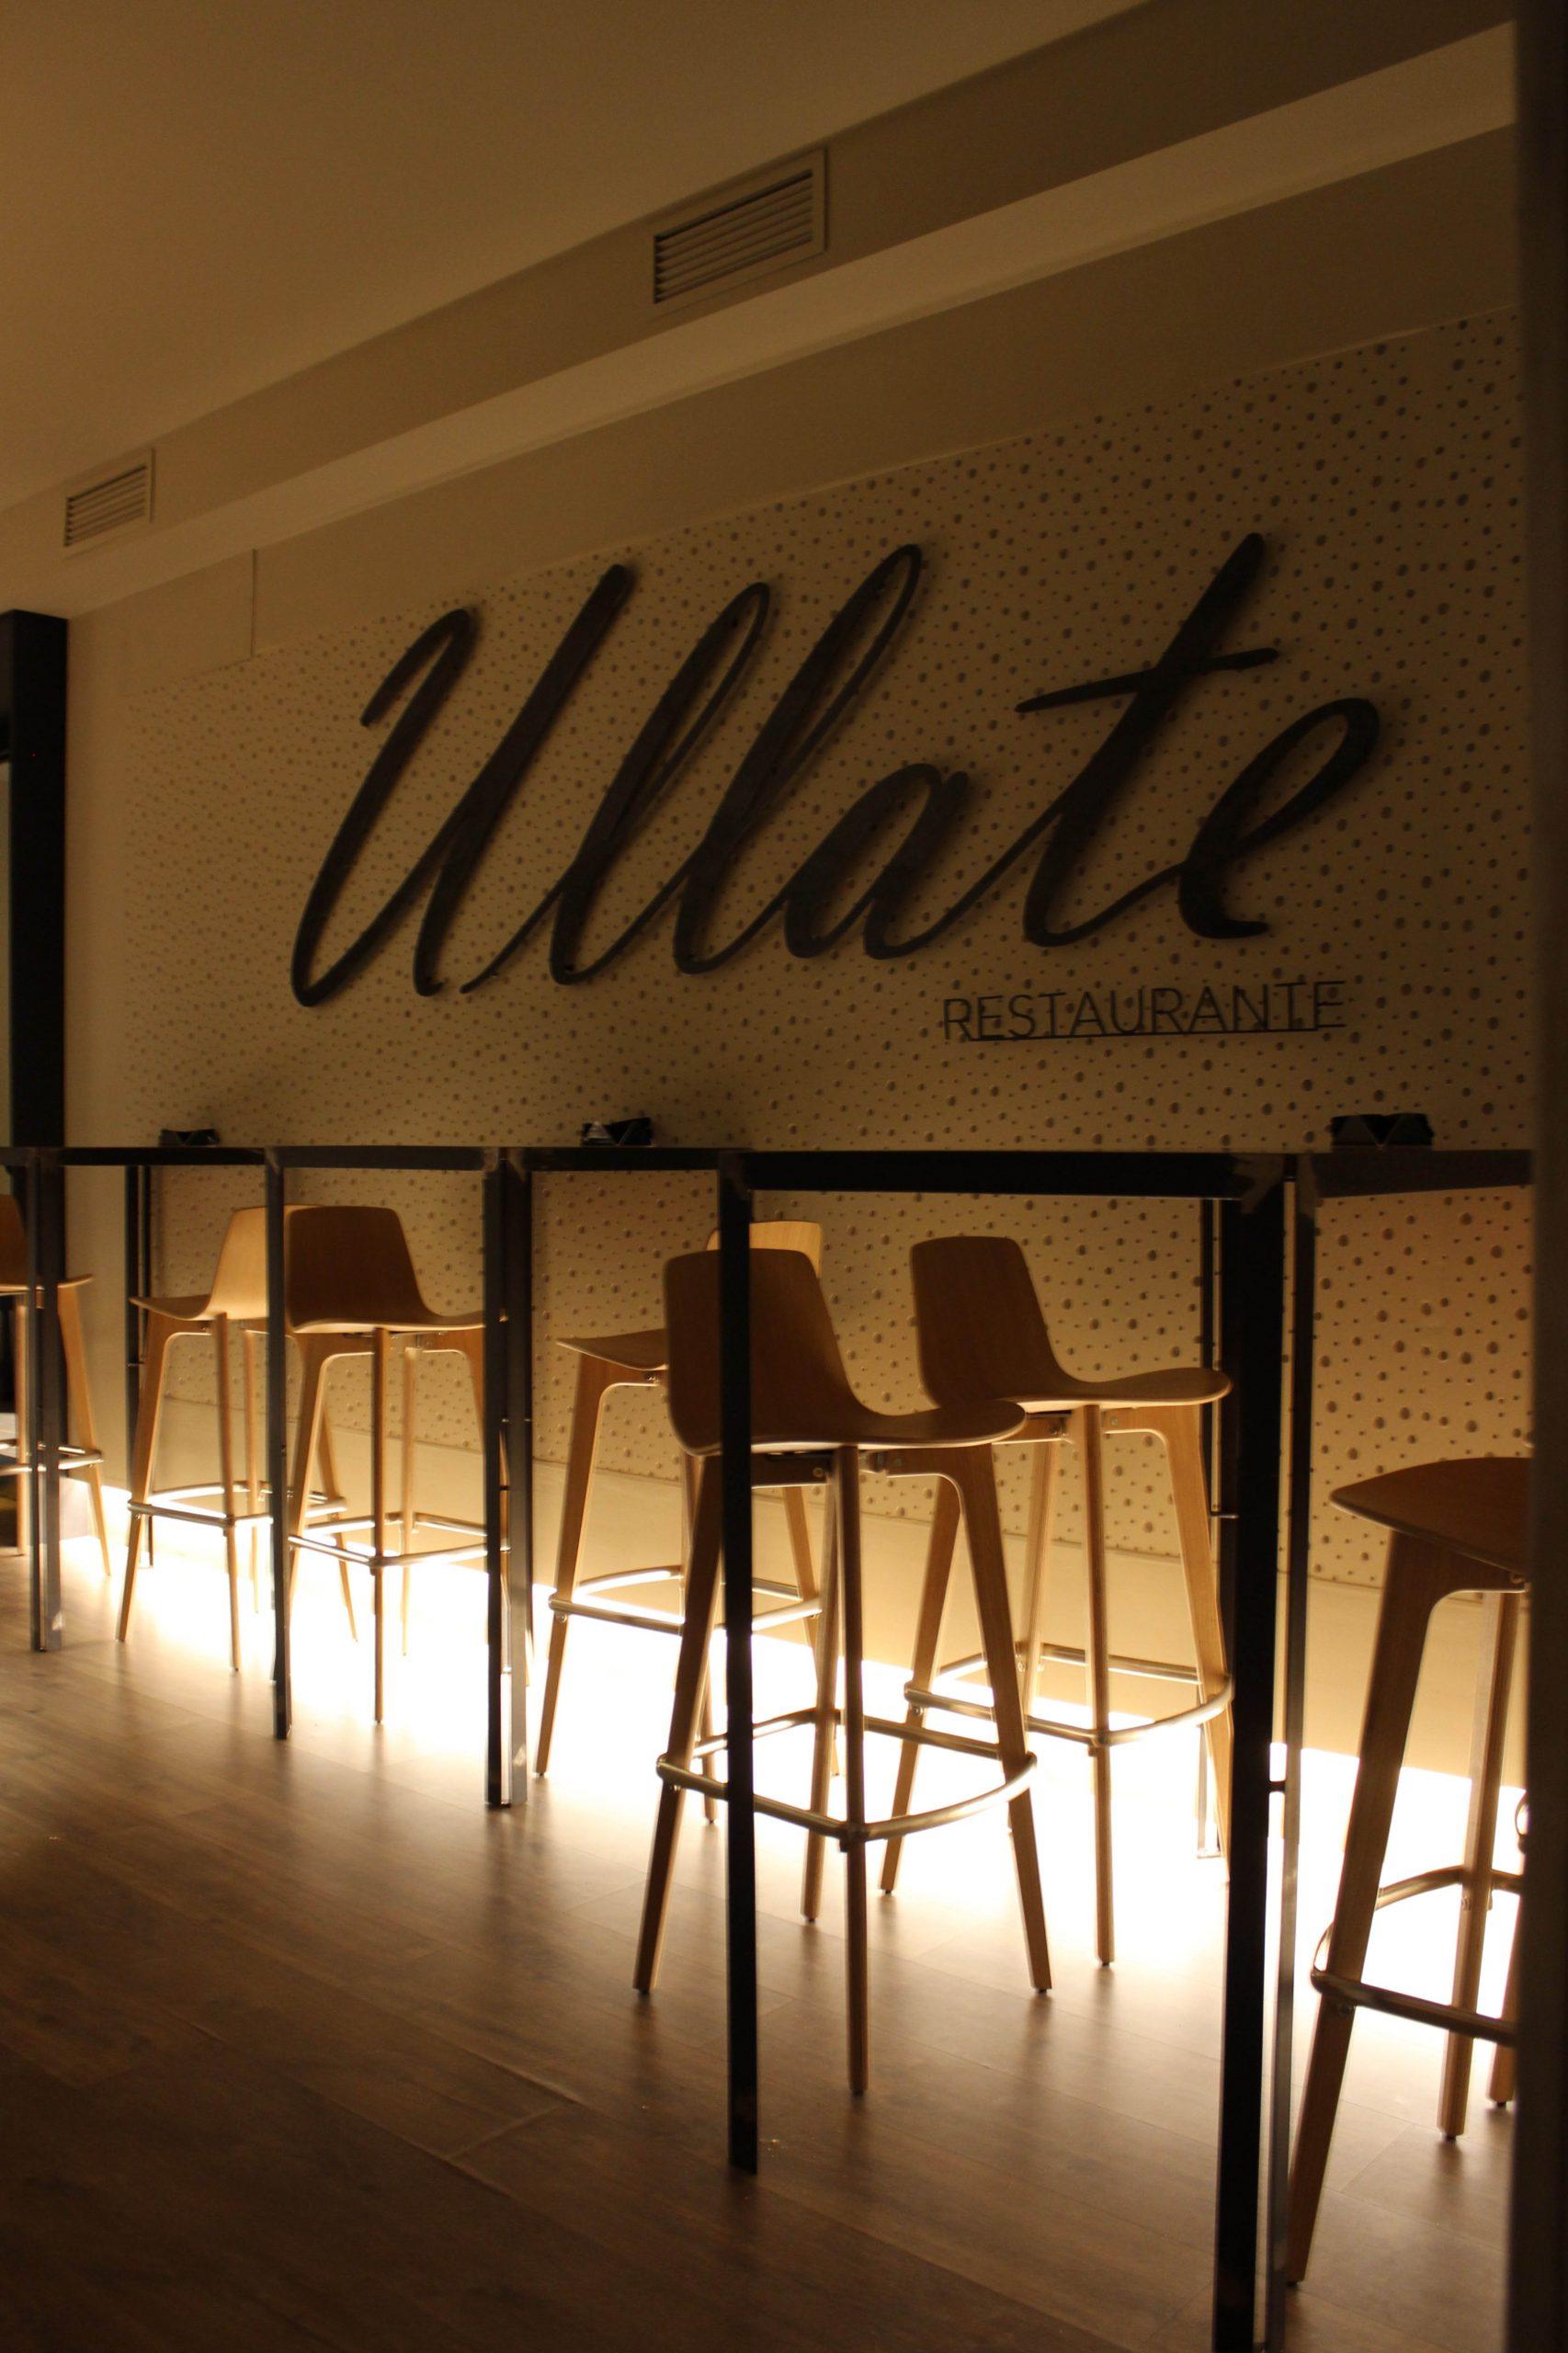 http://gustavolahera.com/wp-content/uploads/2020/11/Foto-3-Restaurante-Ullate-scaled.jpg